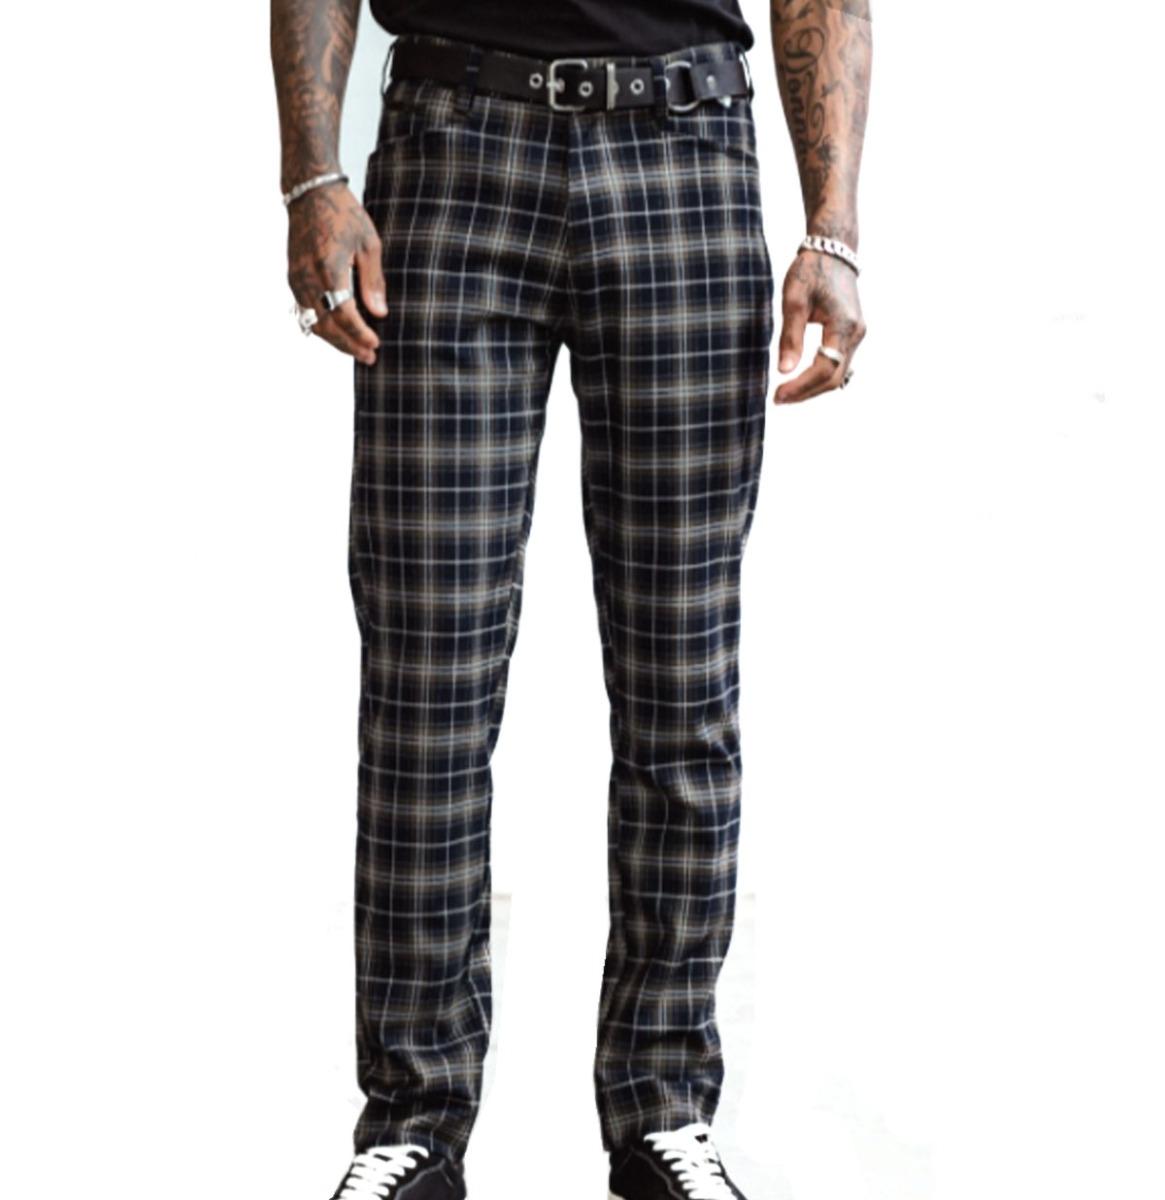 Chet Rock Chuck Skinny Trousers Tartan Green